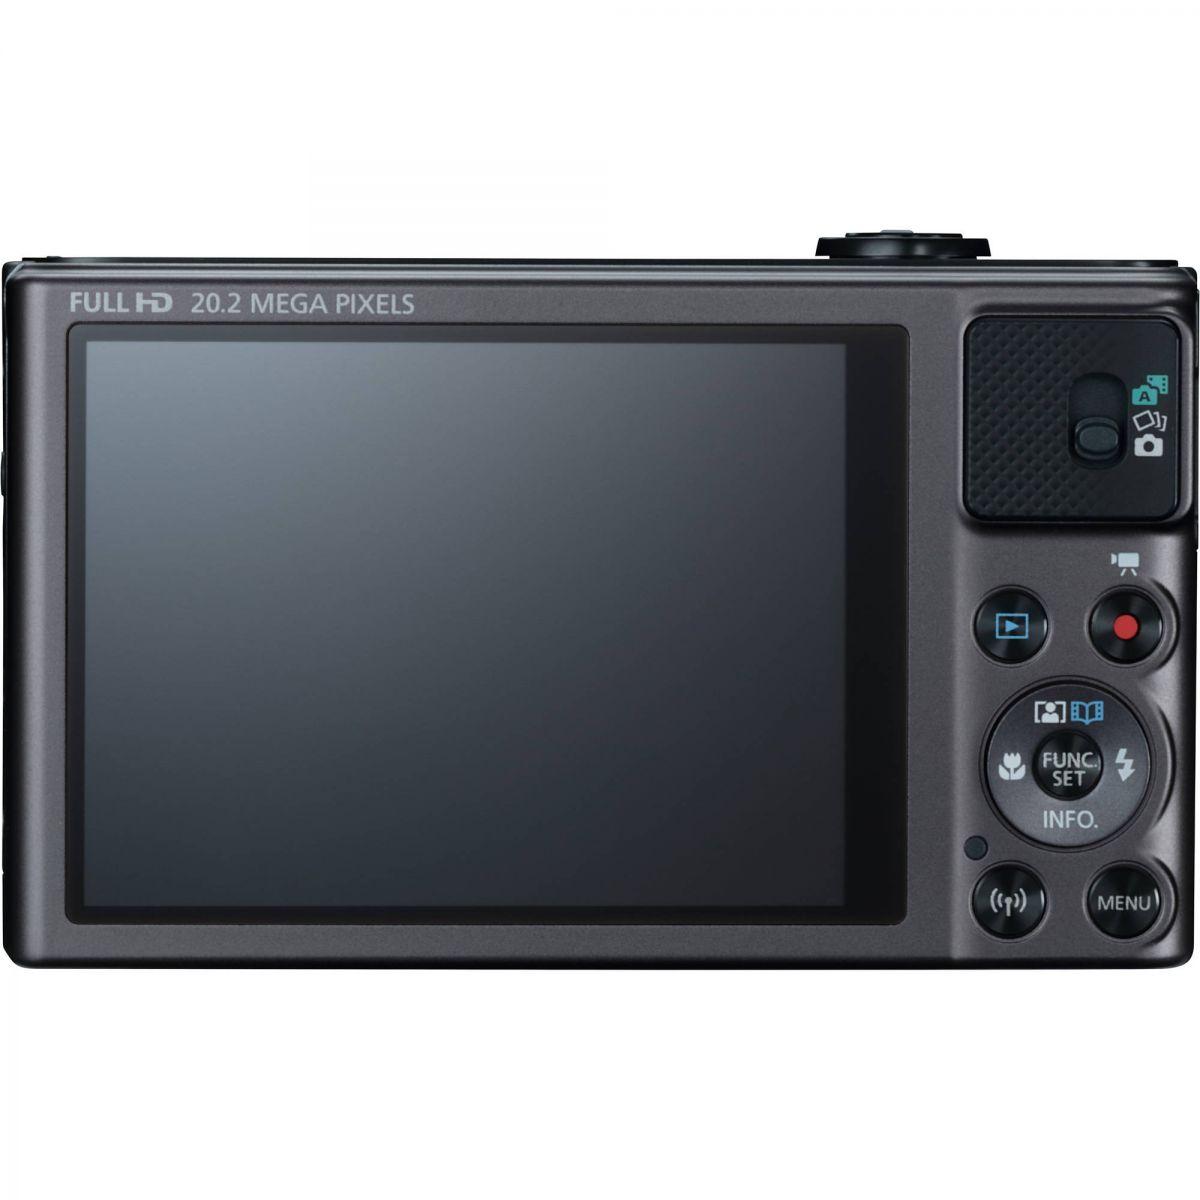 Câmera Digital Canon SX-620HS com 20.2 Megapixels e Processador DIGIC 4,  Zoom de 25x , WI-FI, NFC, 3